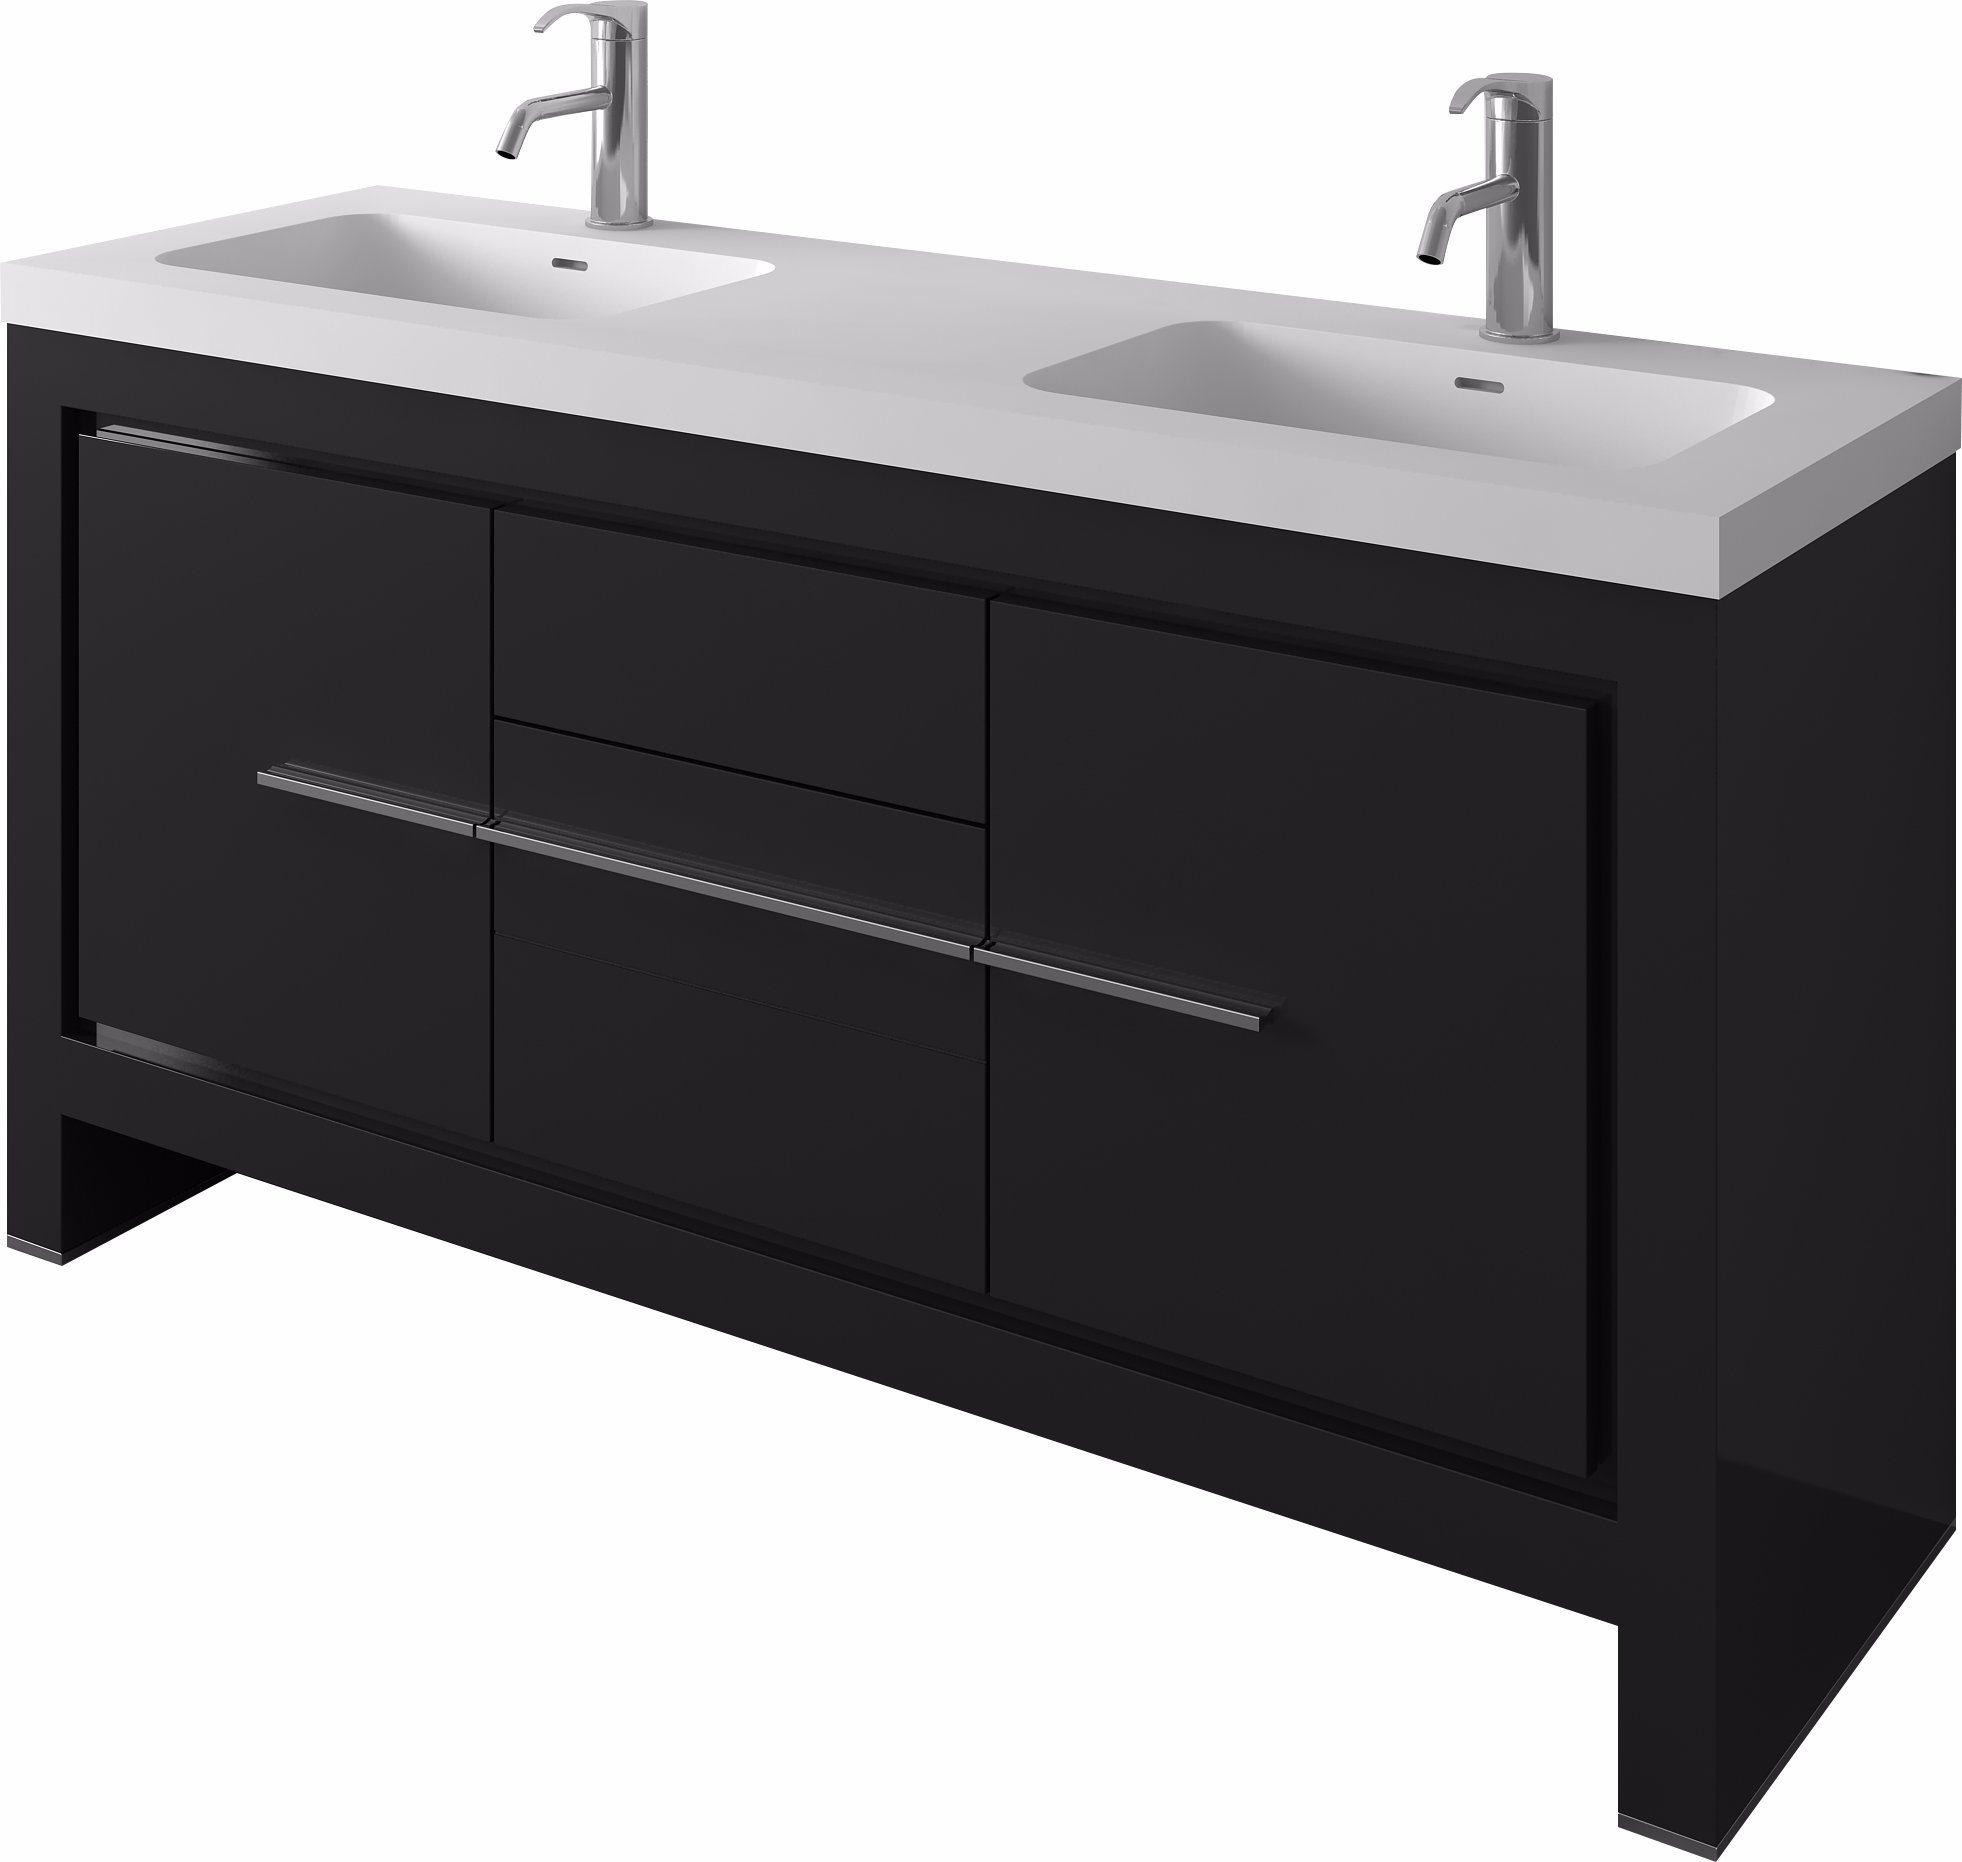 Double Sinks Bathroom Mdf Furniture